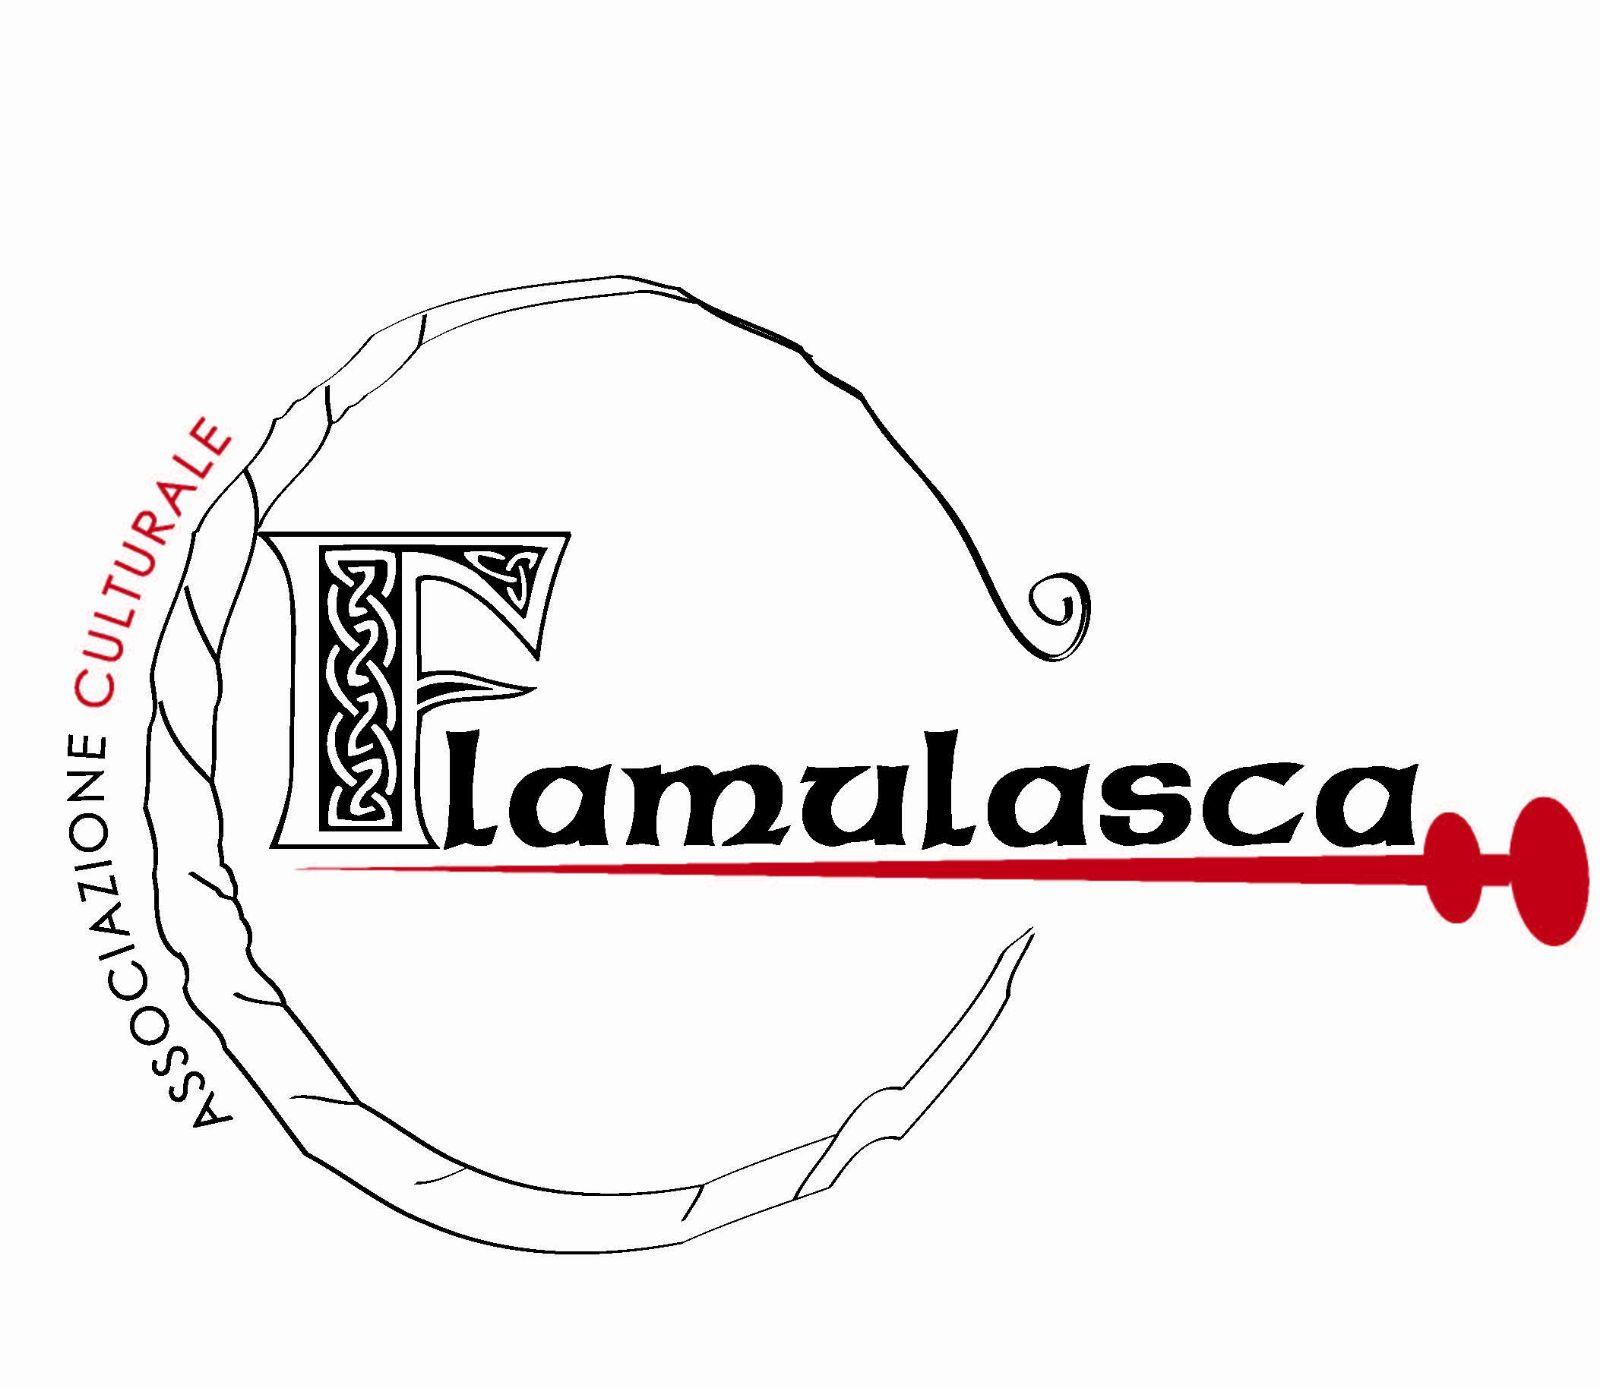 flamulasca